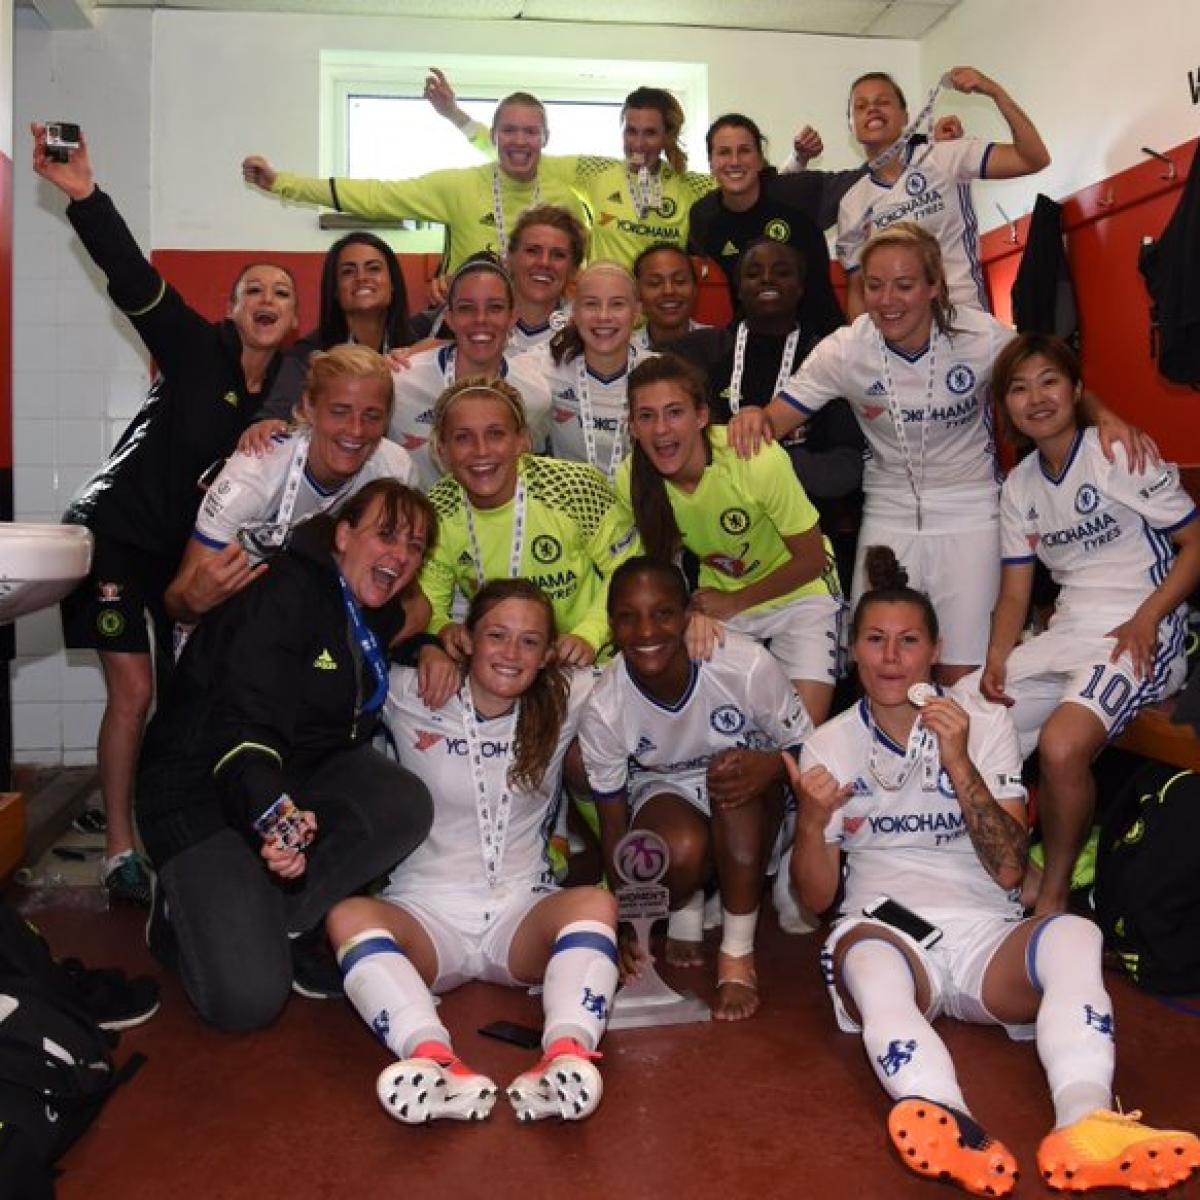 Chelsea crowned champions of Women's Super League, Aston Villa declared Championship winners